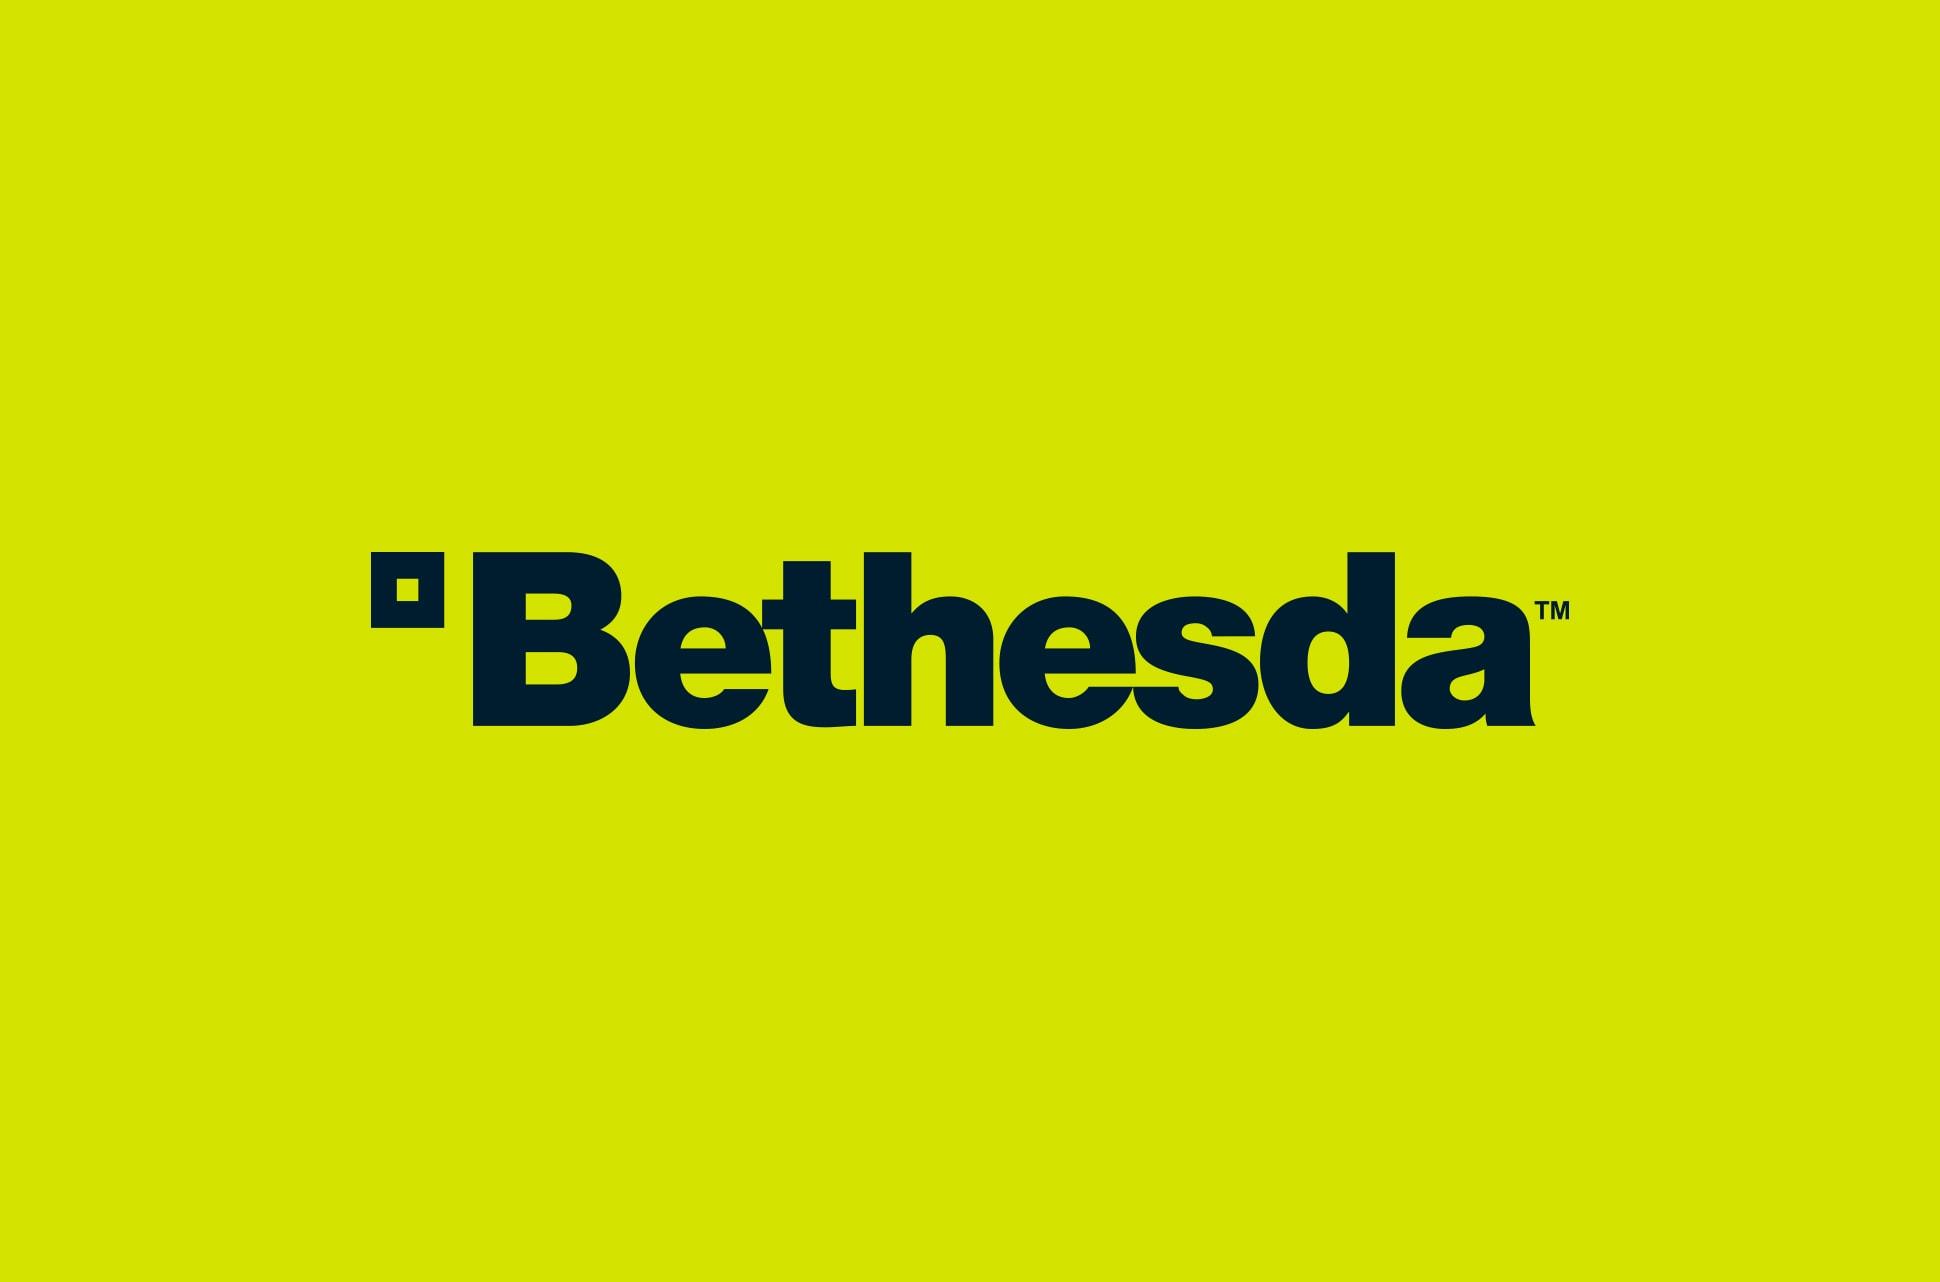 Bethesda logo.